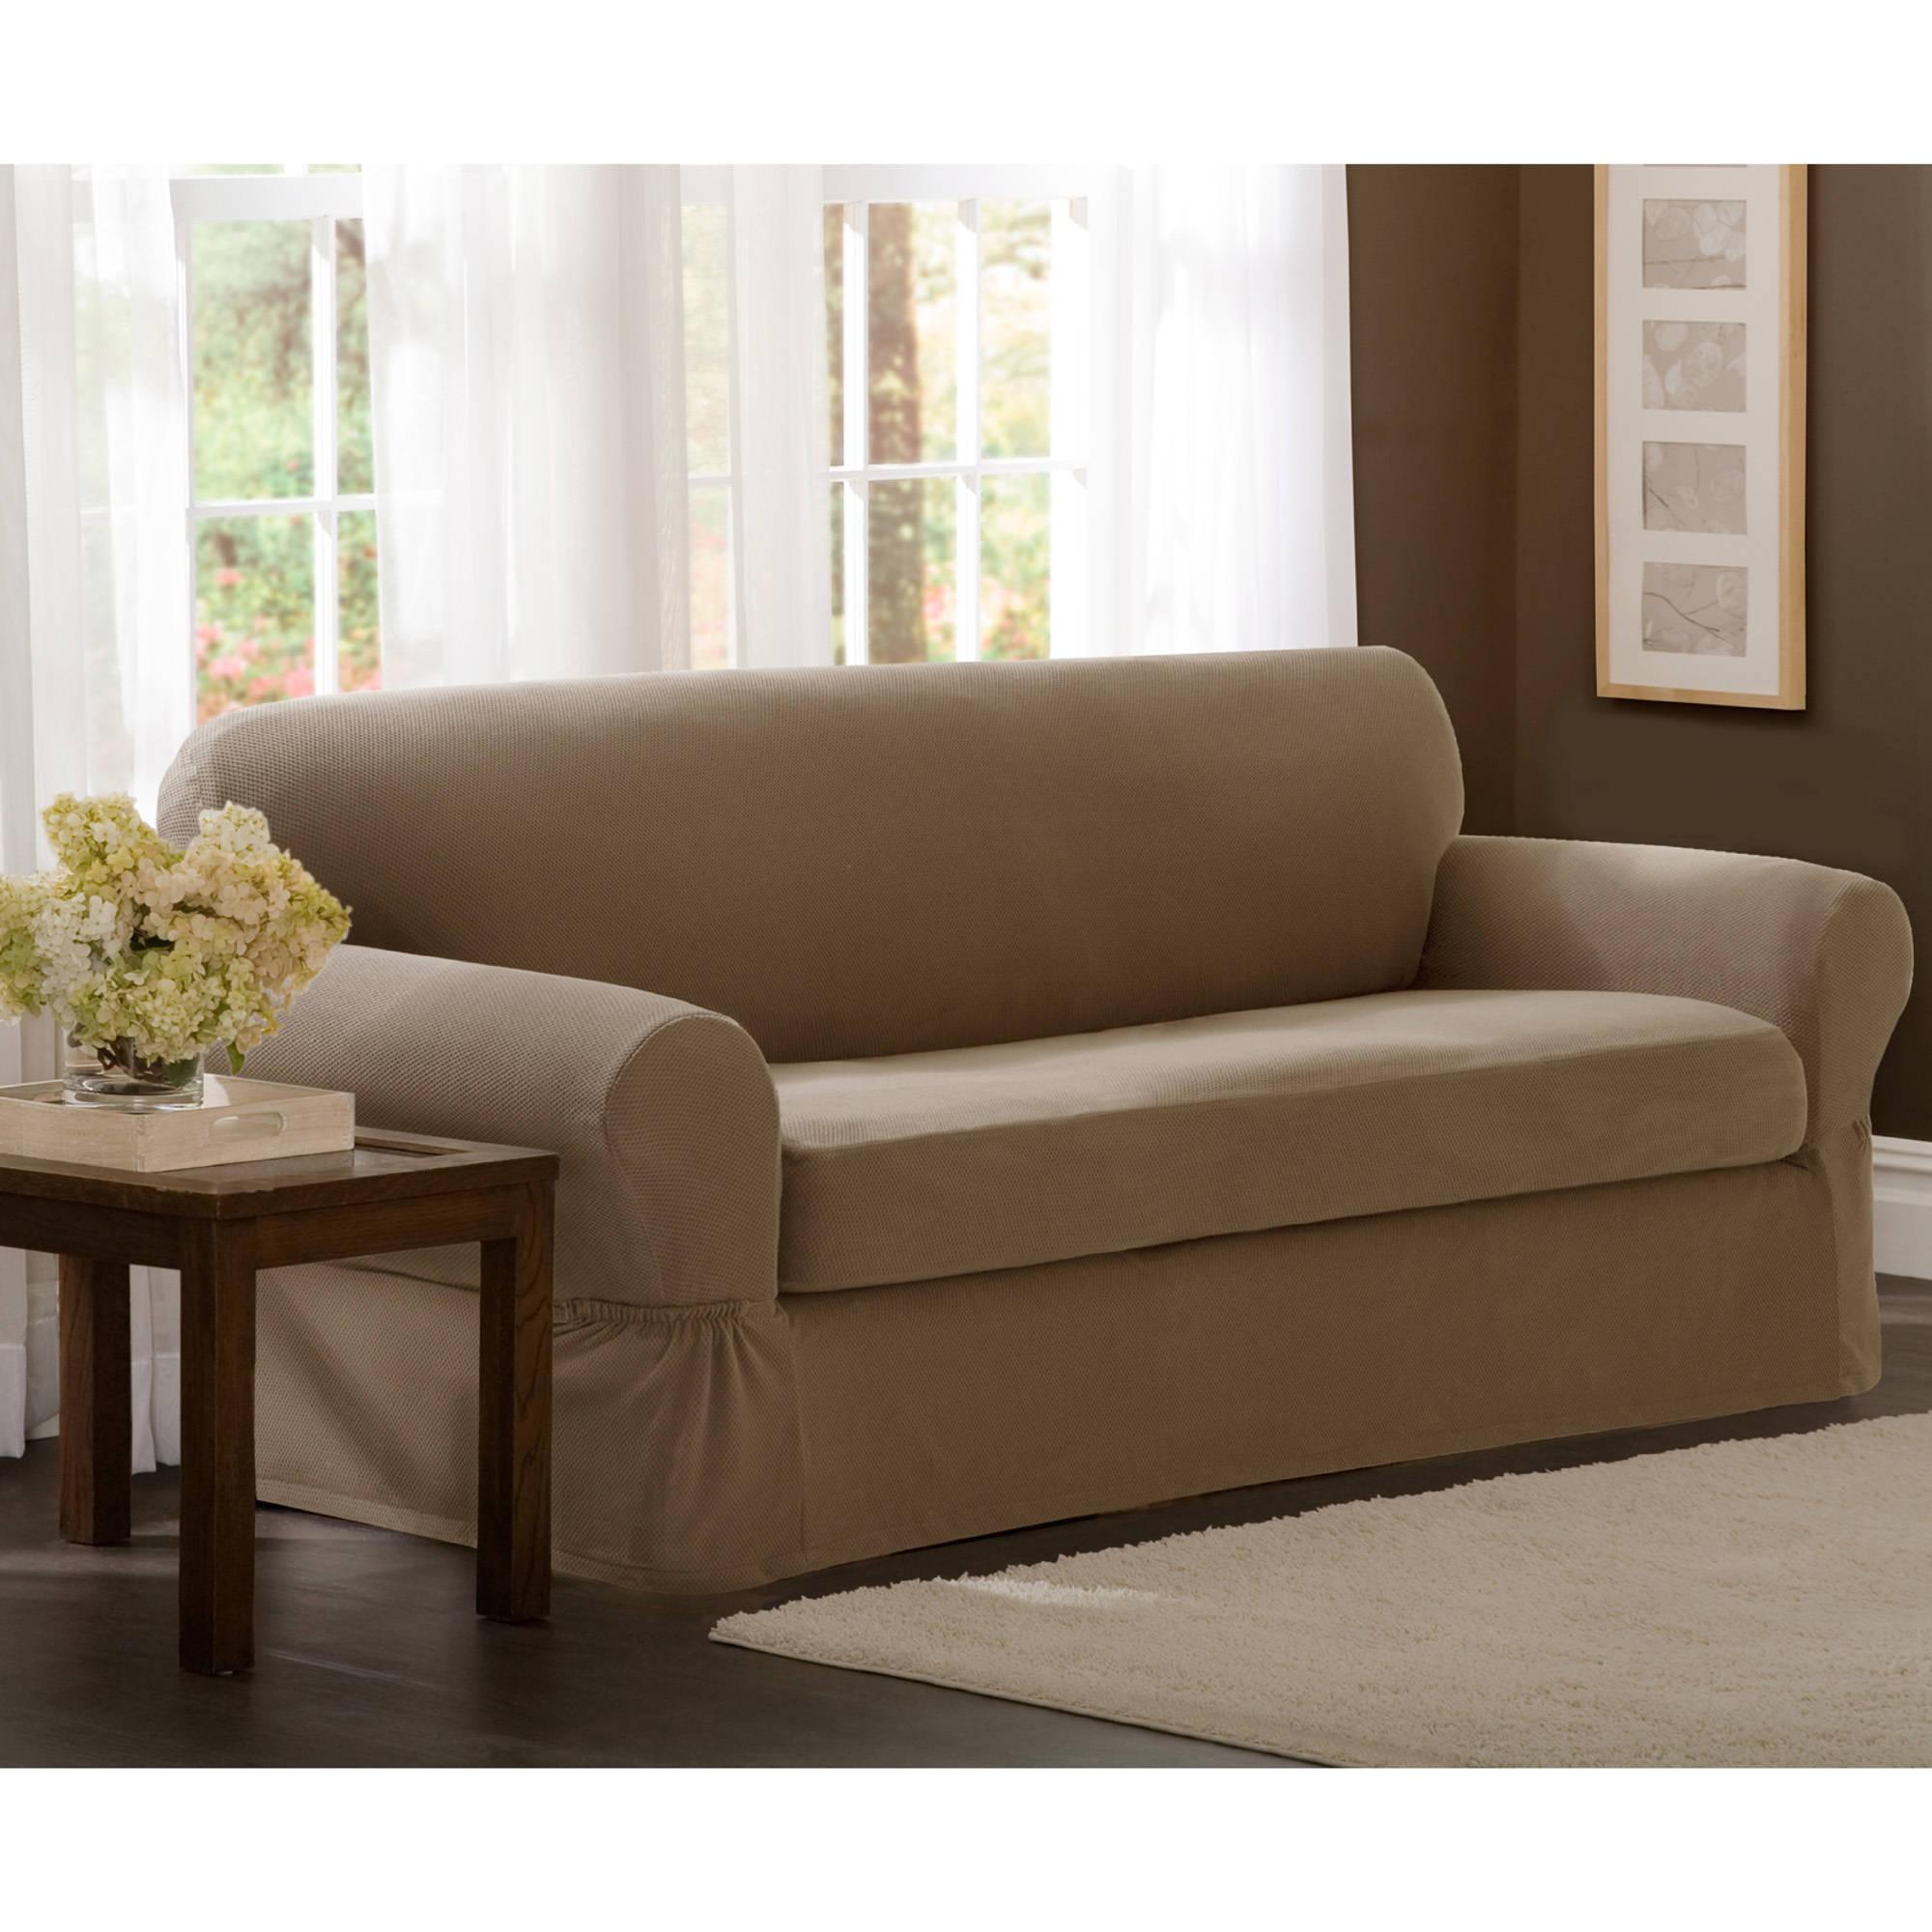 maytex stretch 2-piece sofa slipcover - walmart.com KFYBAJR